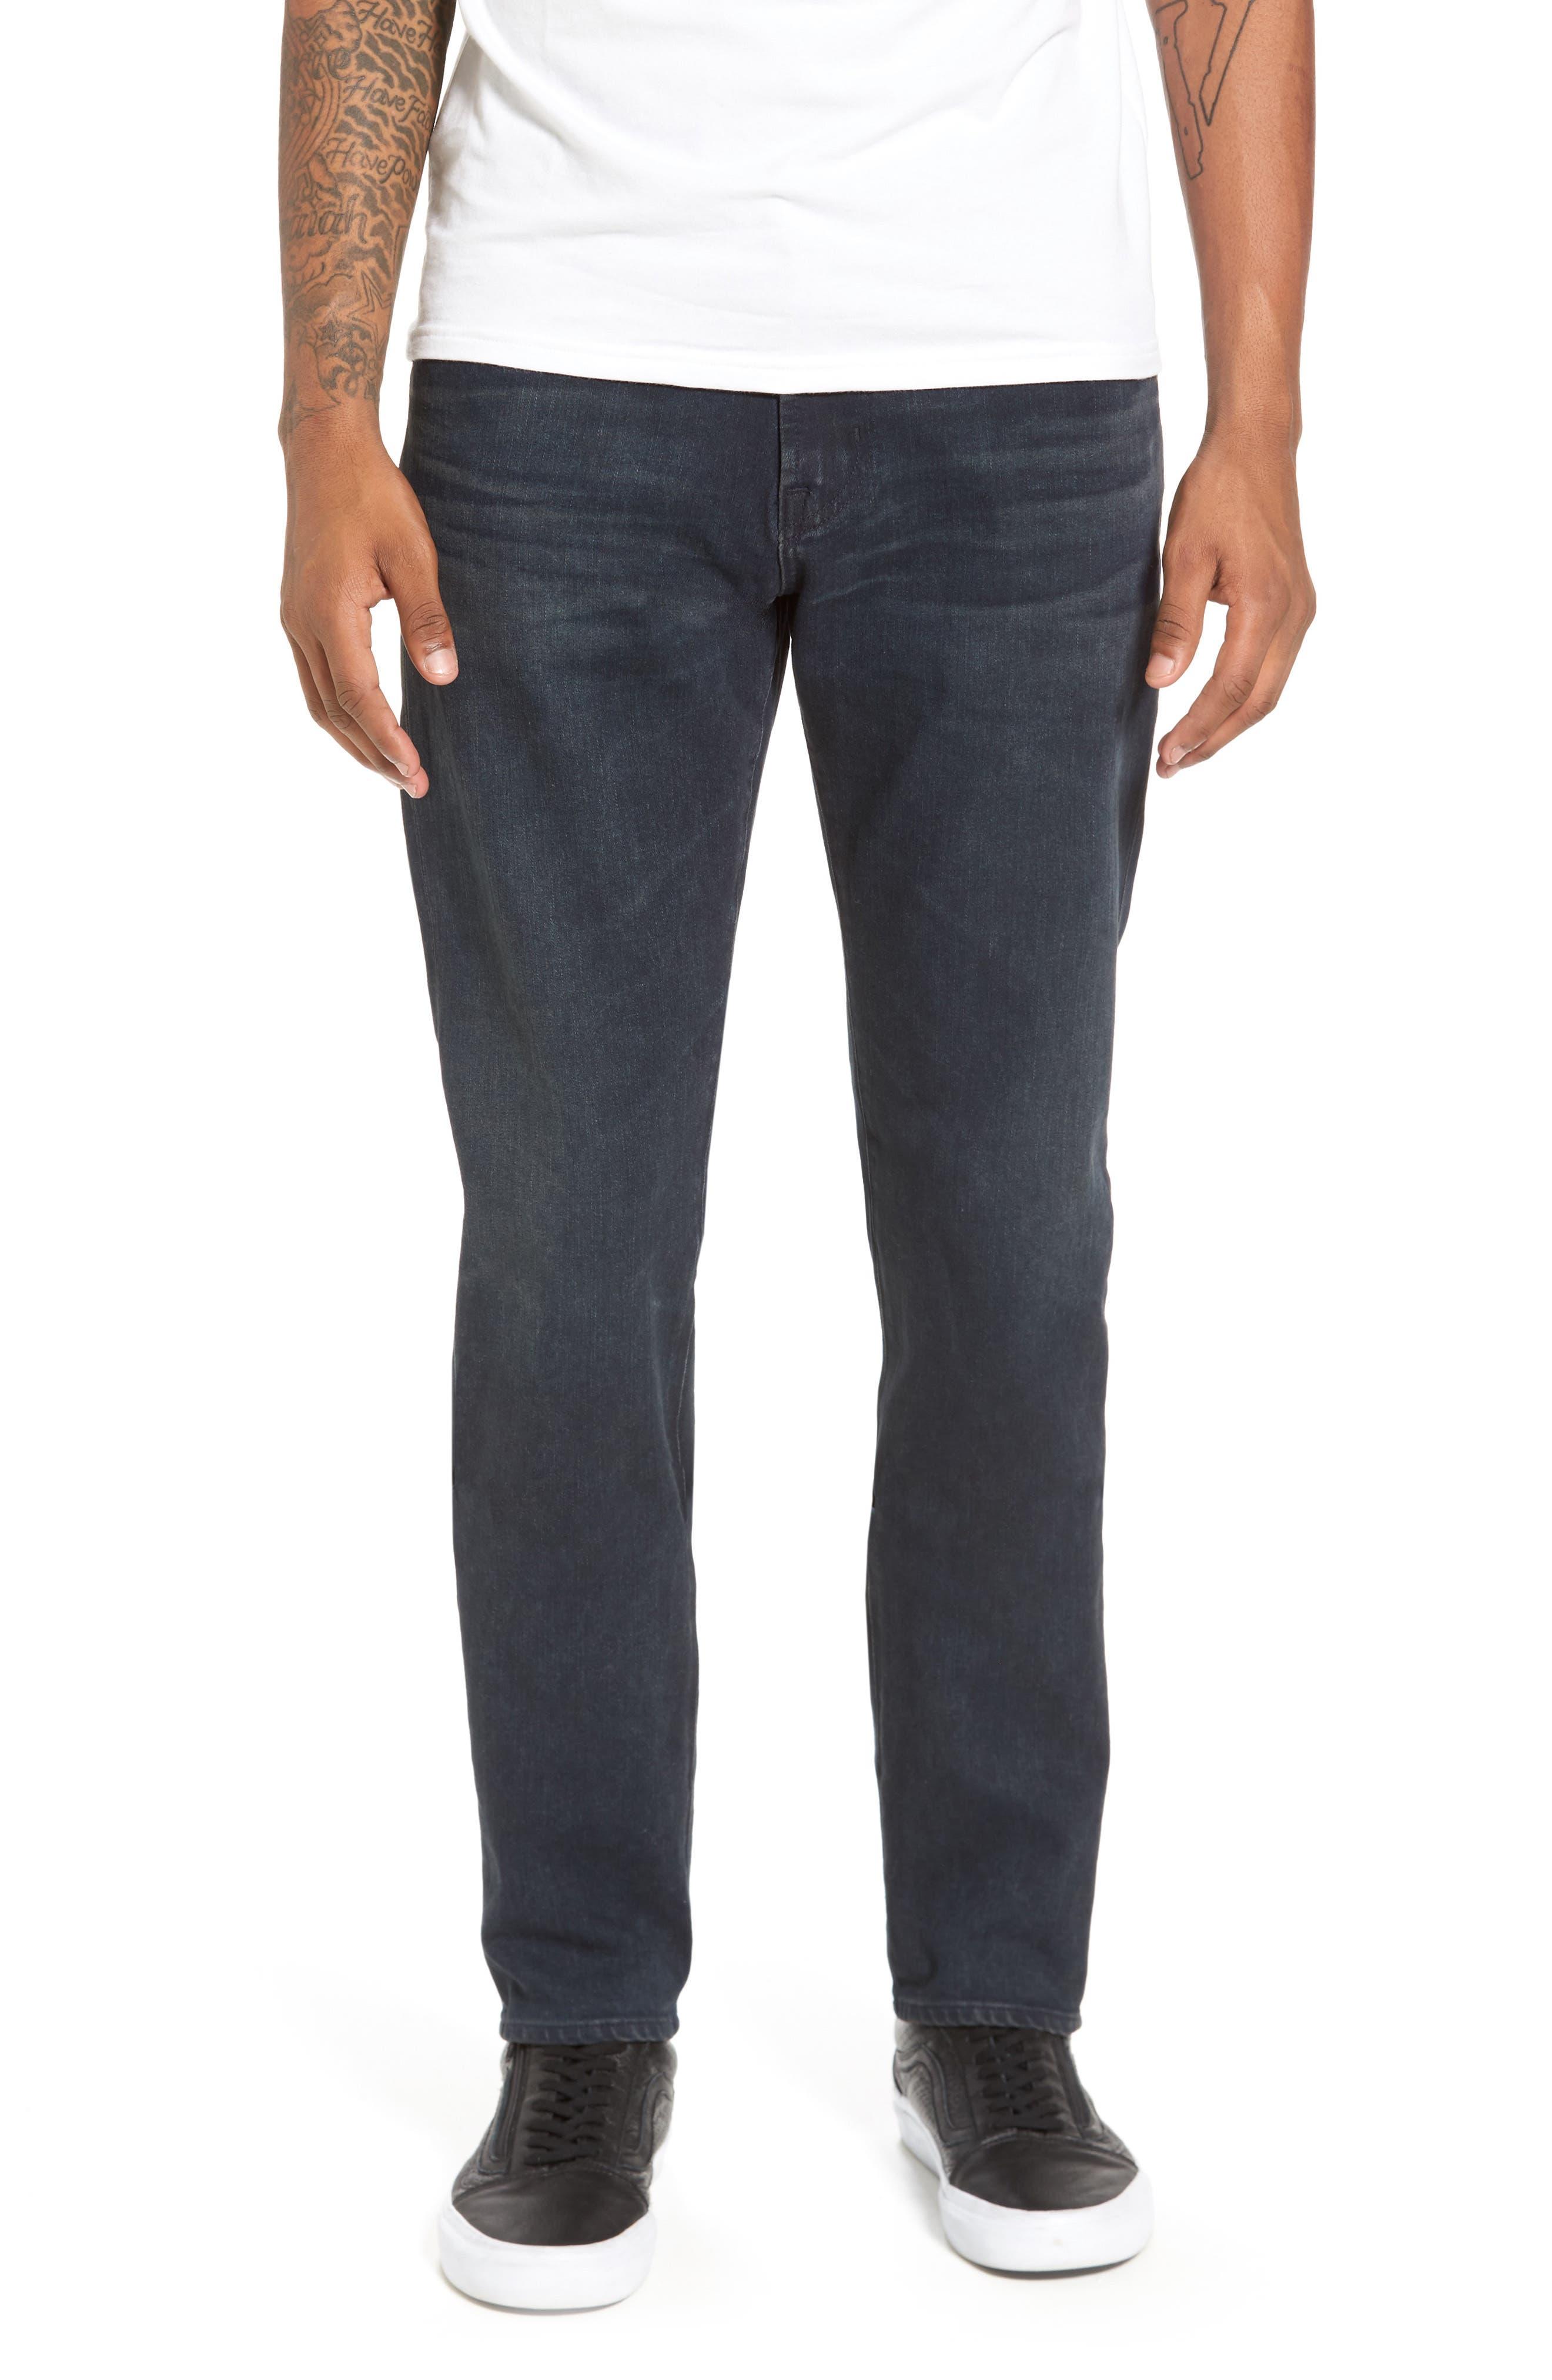 AG Dylan Skinny Jeans (6 Years Night Scene)